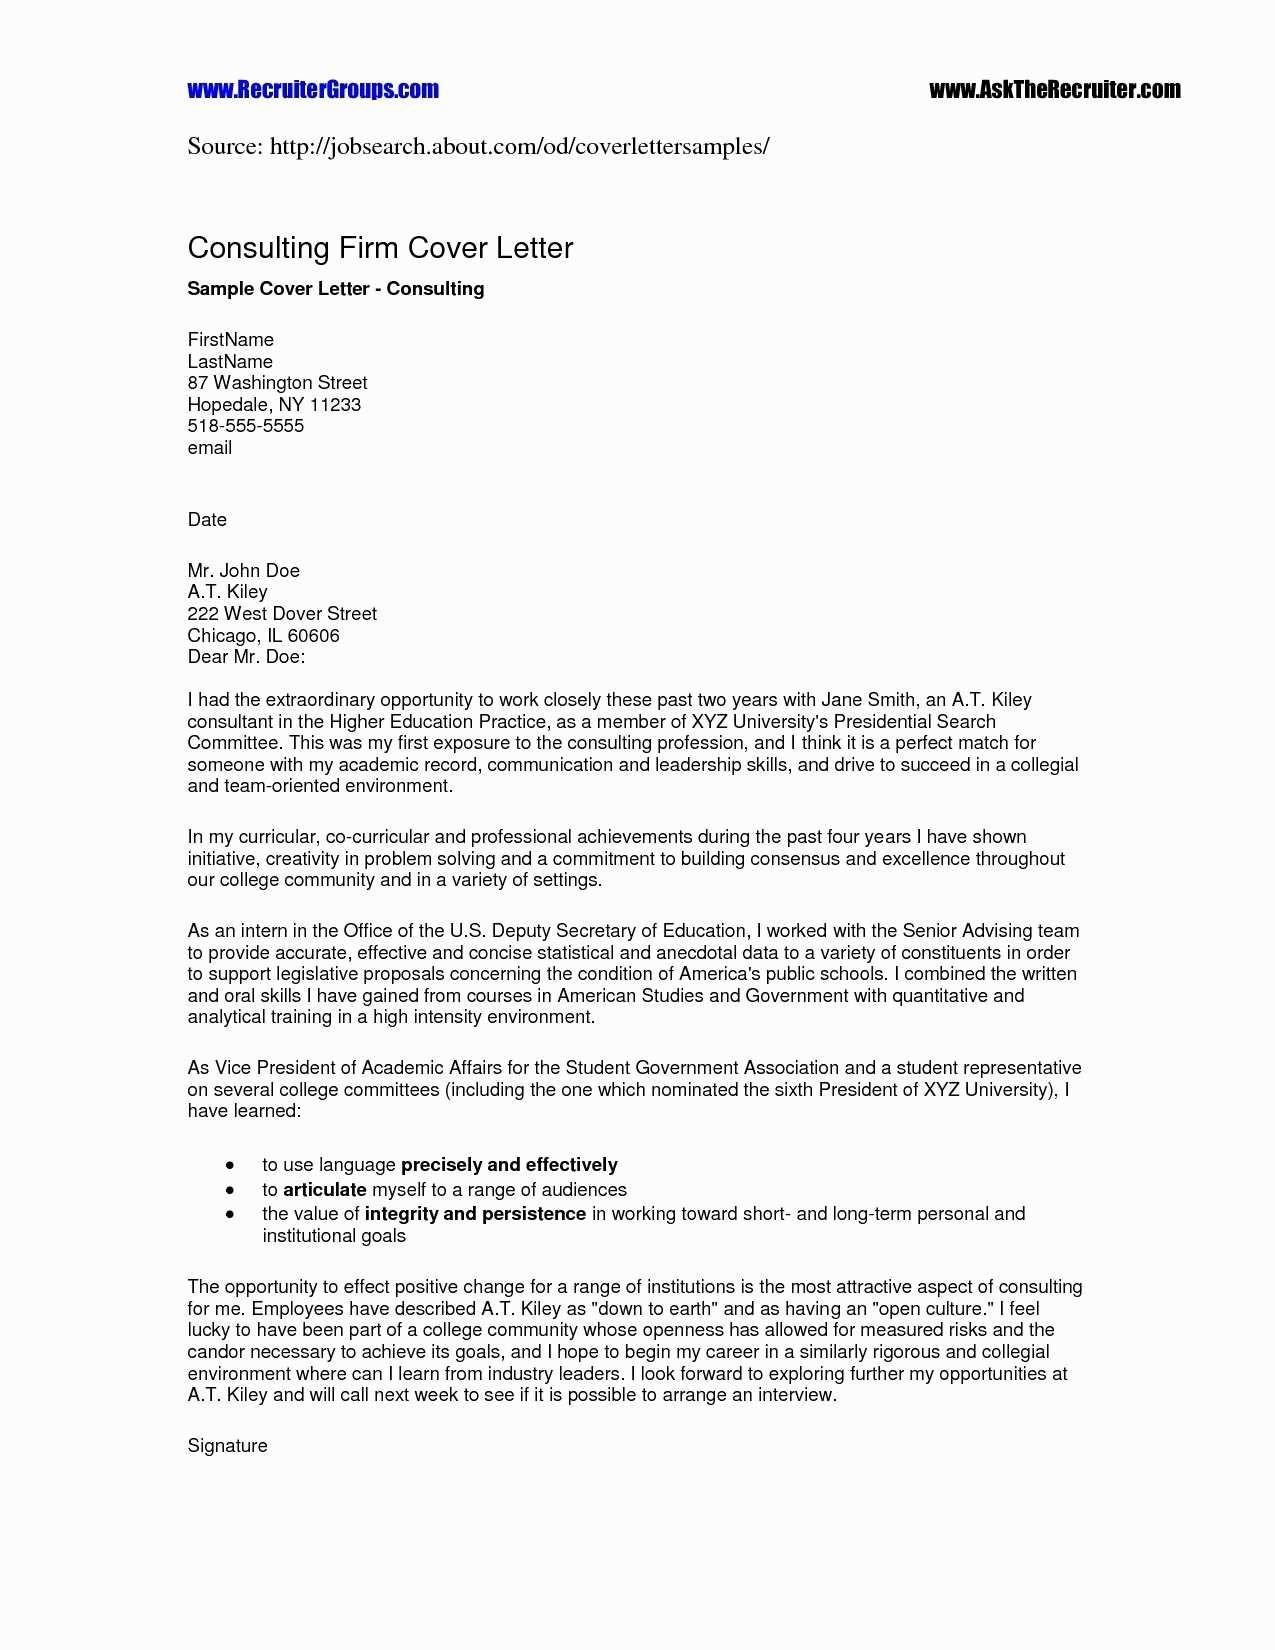 Voe Letter Template - Severance Letter Template